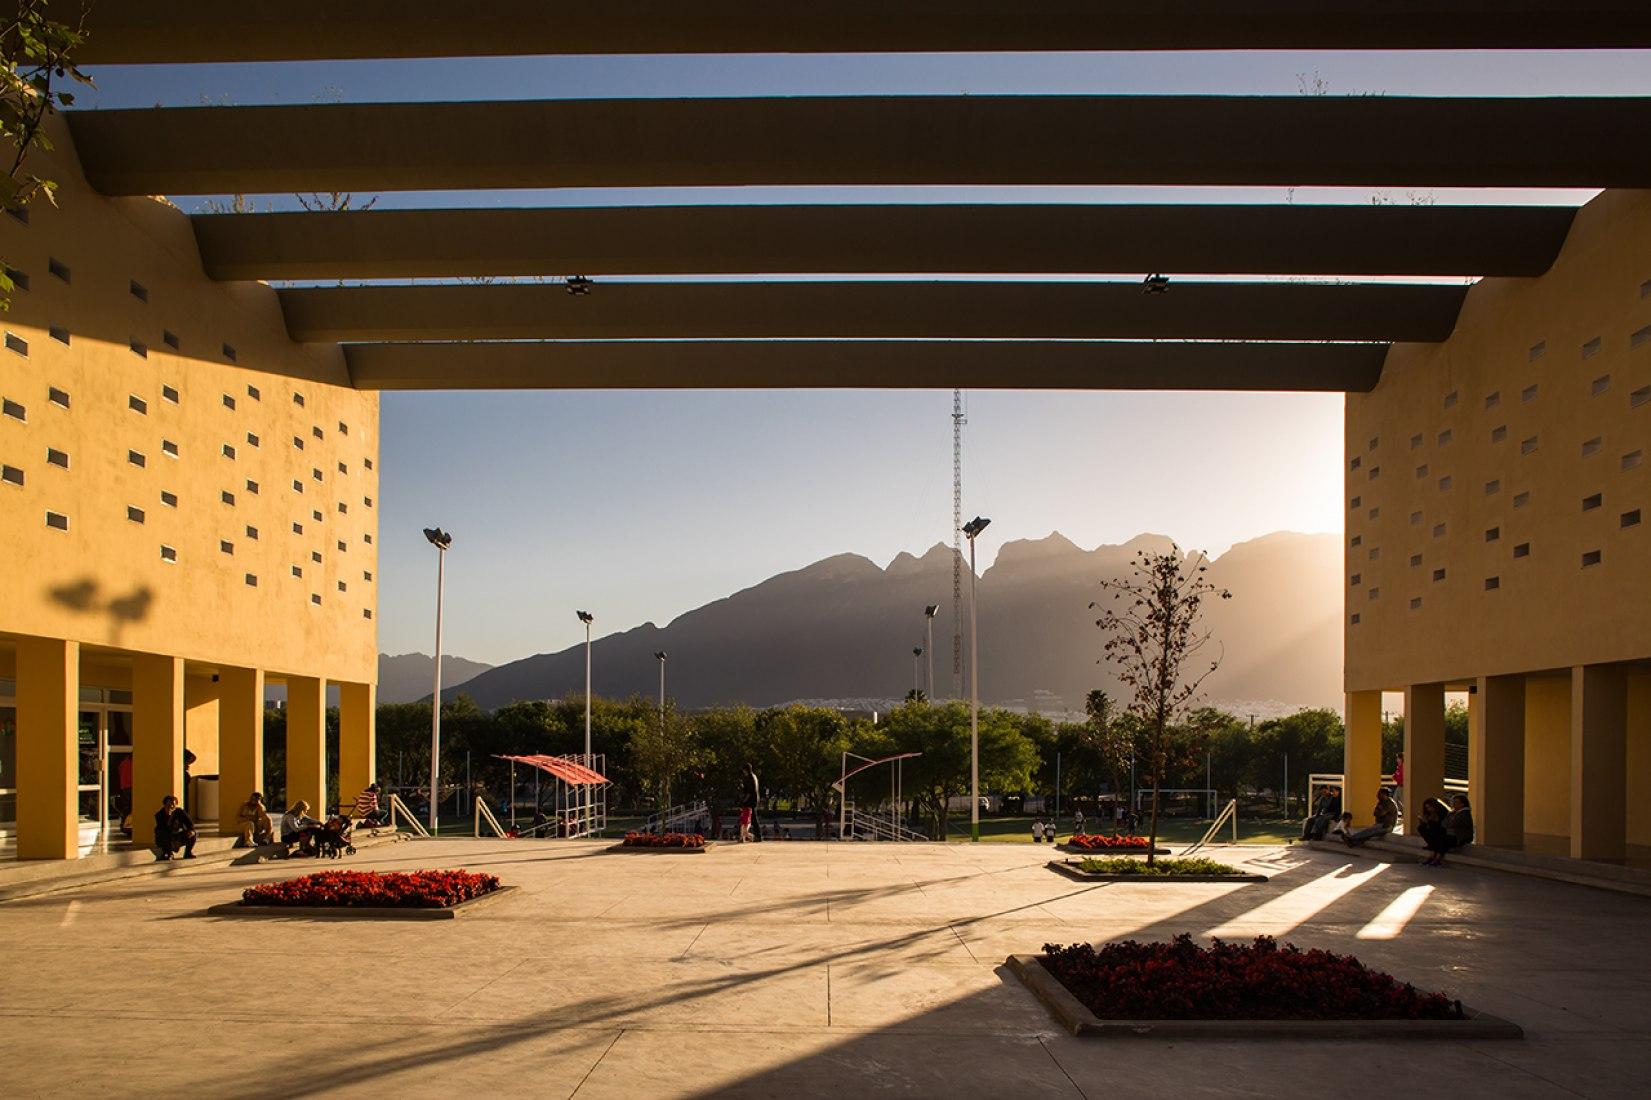 Centro comunitario San Bernabé por Pich-Aguilera Arquitectos. Fotografía © Jorge Taboada.